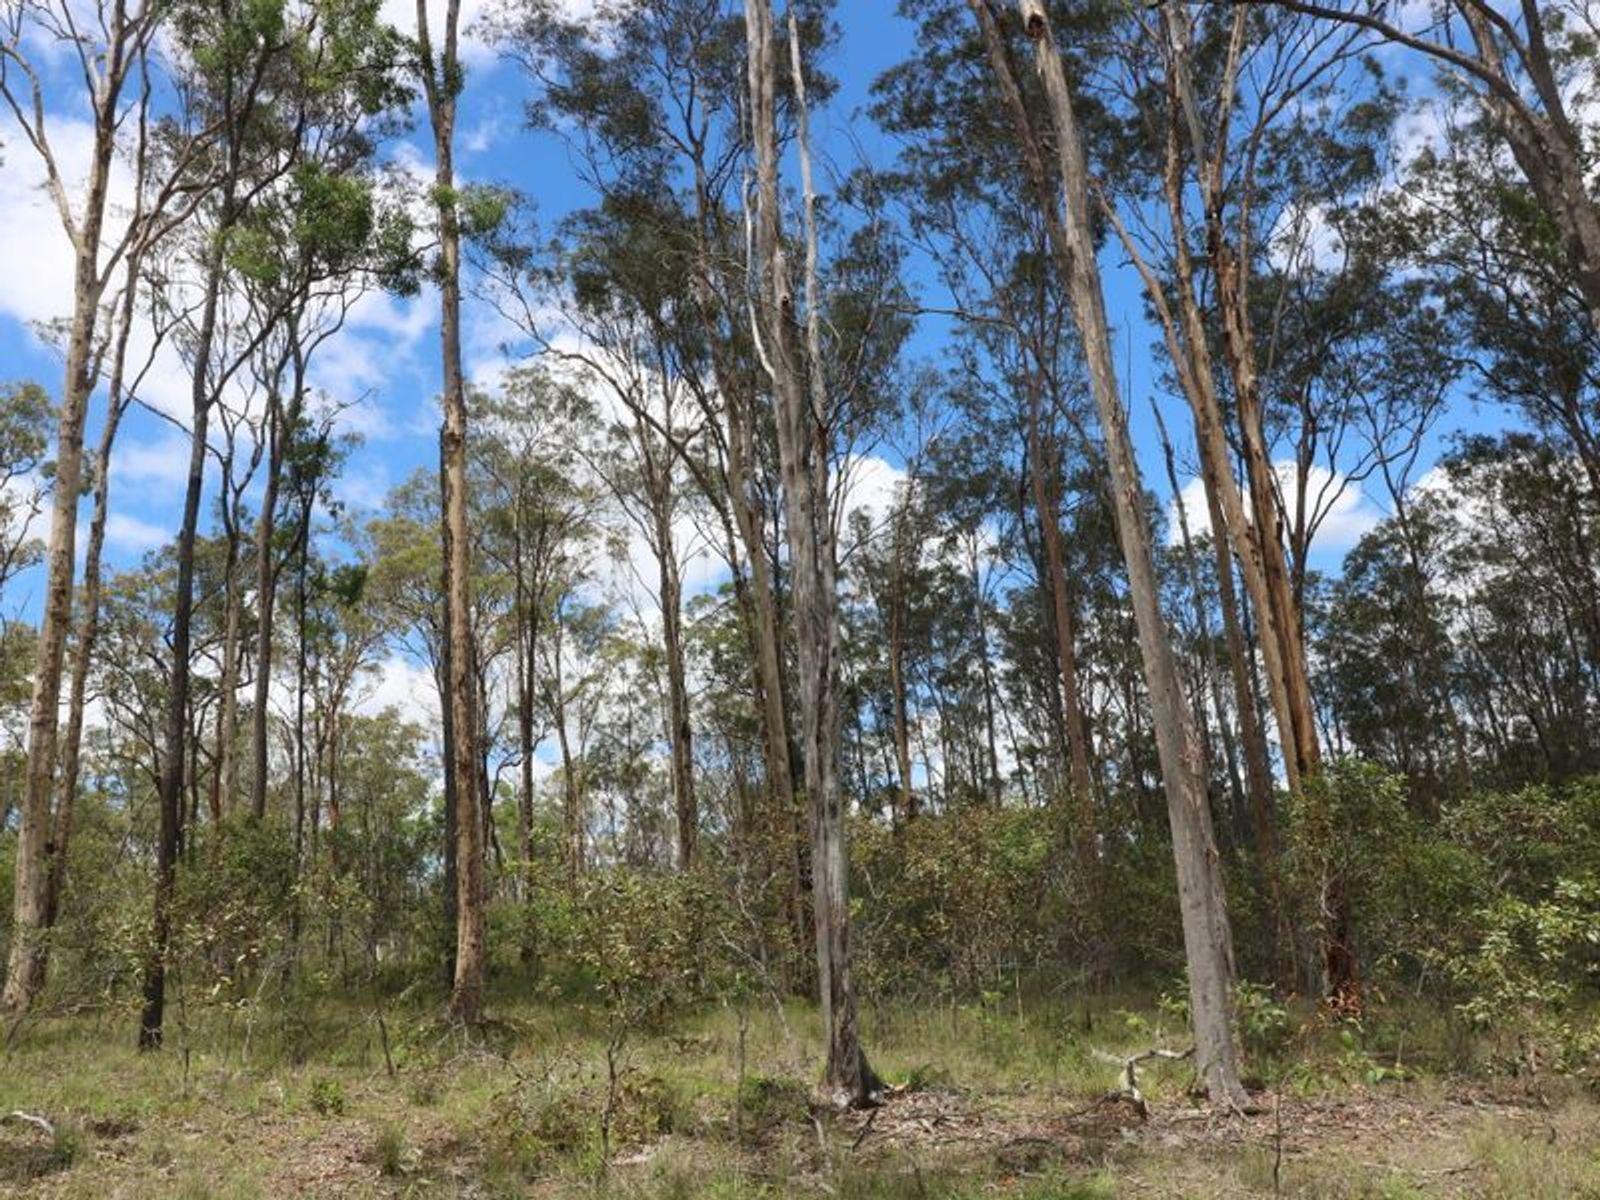 Lot 47/0 Mullers Road, Redridge, QLD 4660